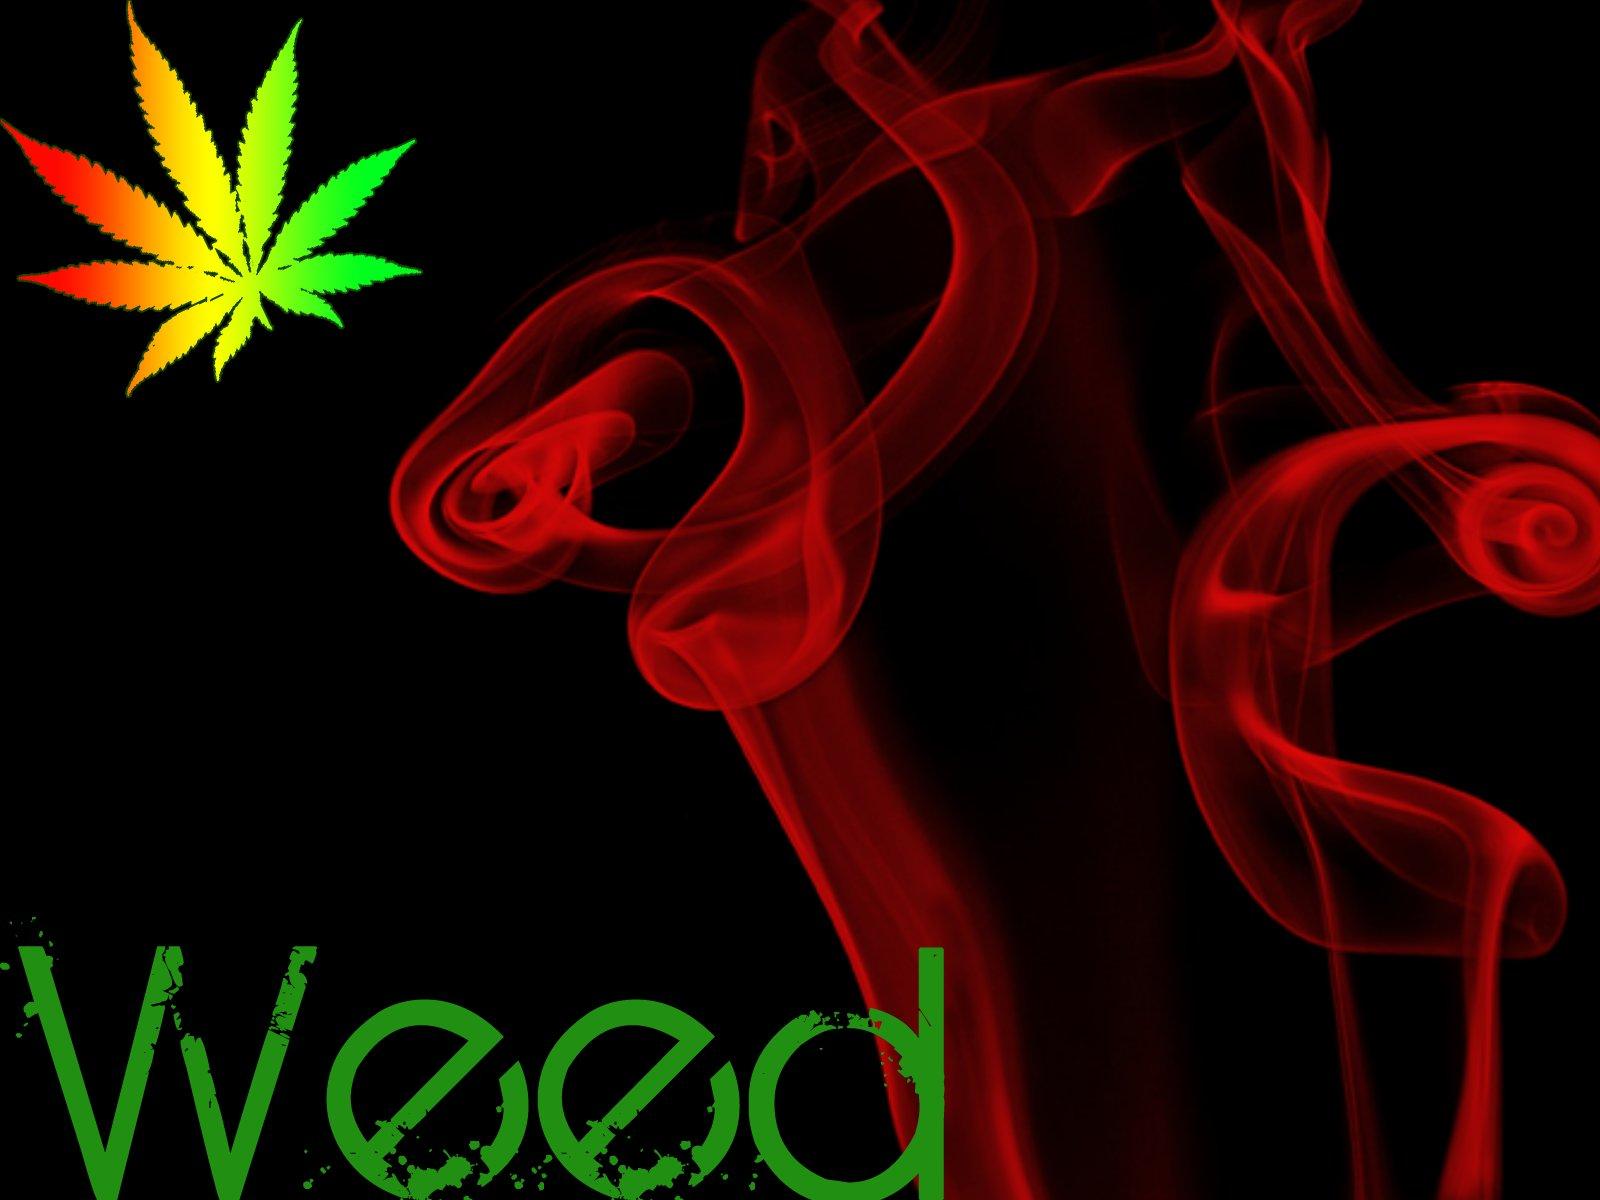 Wallpaper 1600x1200 Px 420 Drugs Marijuana Psychedelic